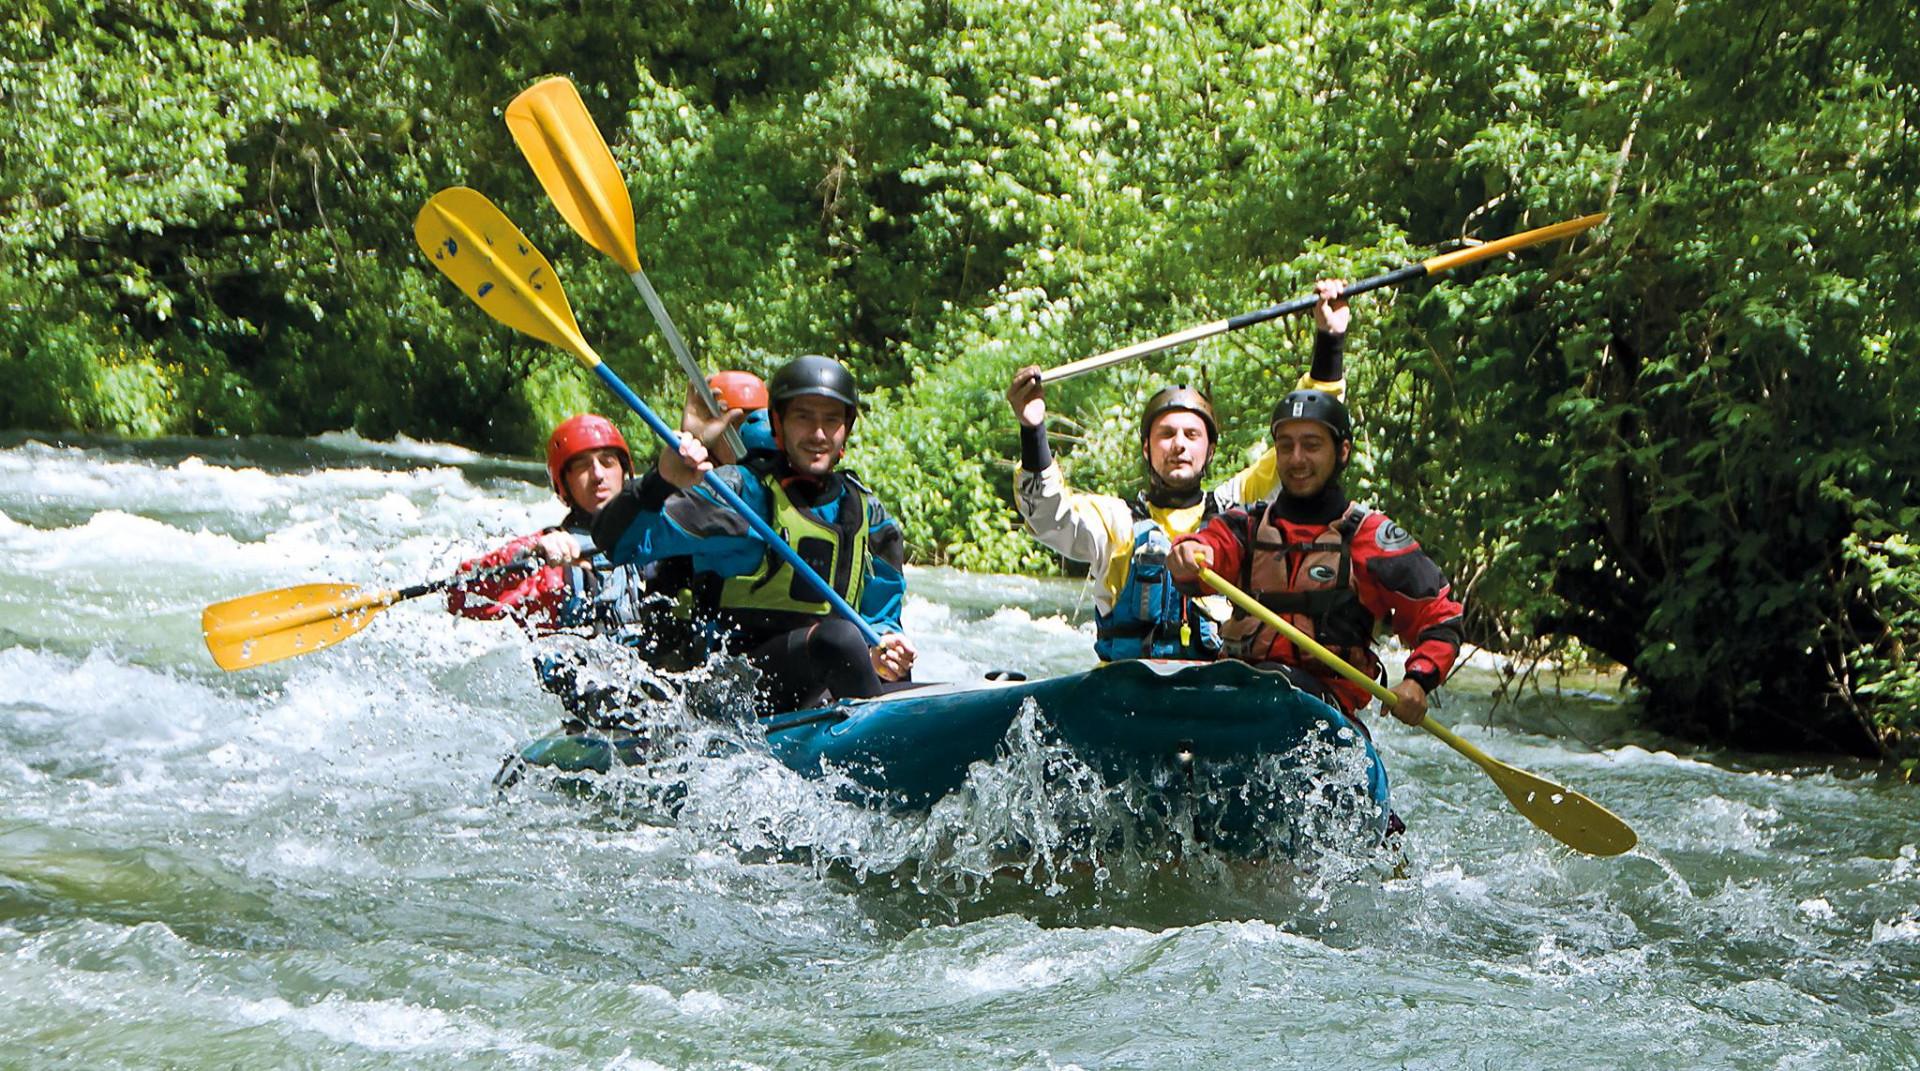 Rafting Adventure sul fiume Corno in Umbria